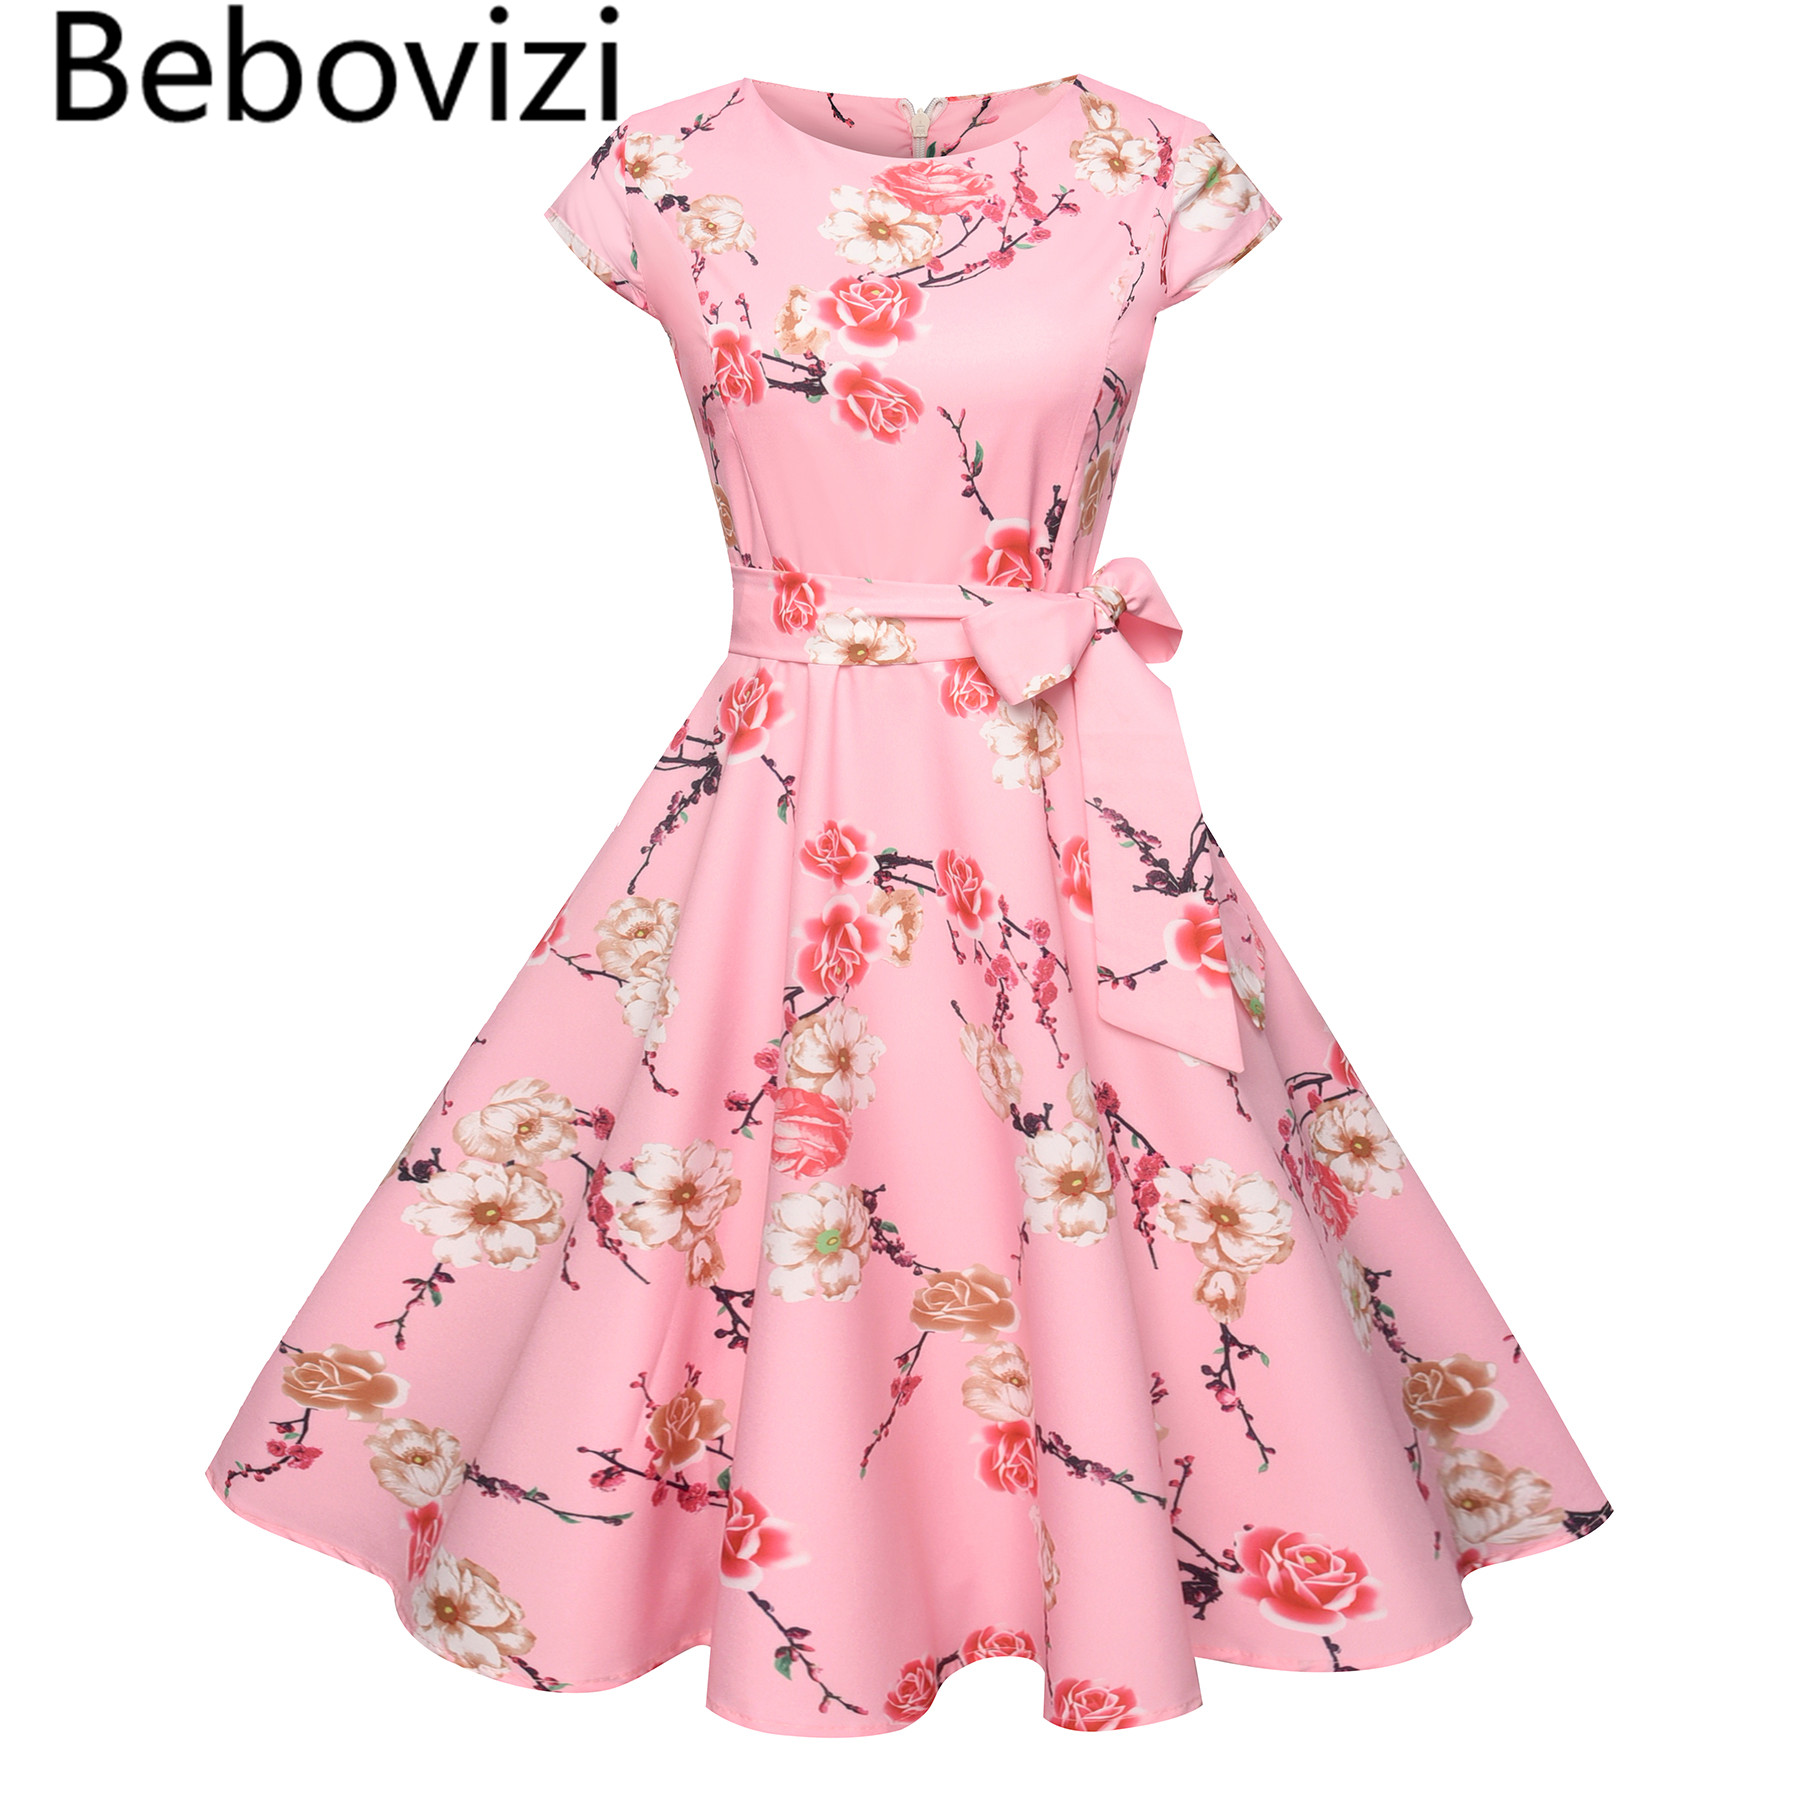 Bebovizi 2018 Big Hemlines Swing Pink Women's Bandage Tunic Dress Vintage Retro Audrey Hepburn Rockabilly Elegant Party Dresses